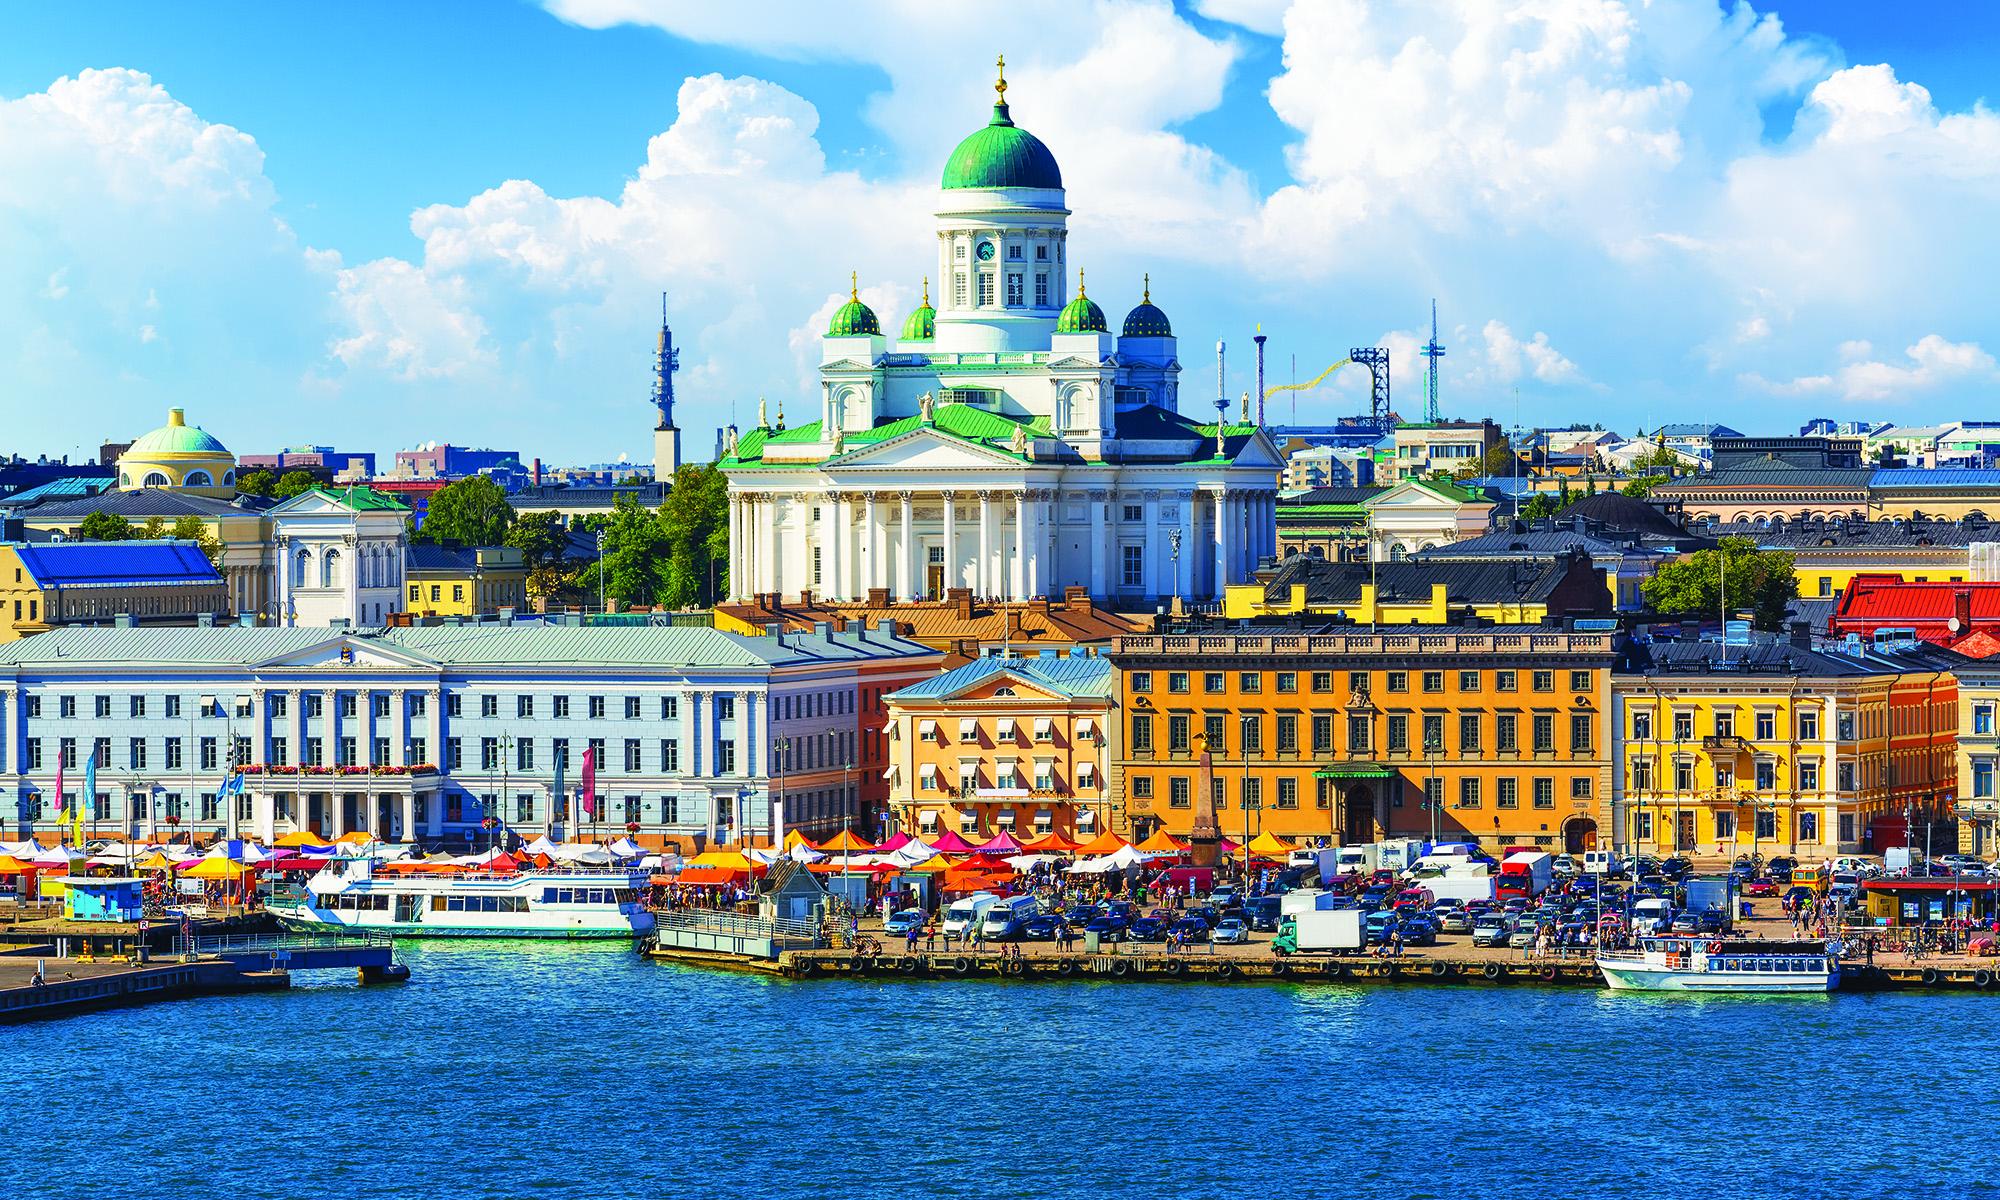 Tour-dEurope-de-lemploi-Finlande